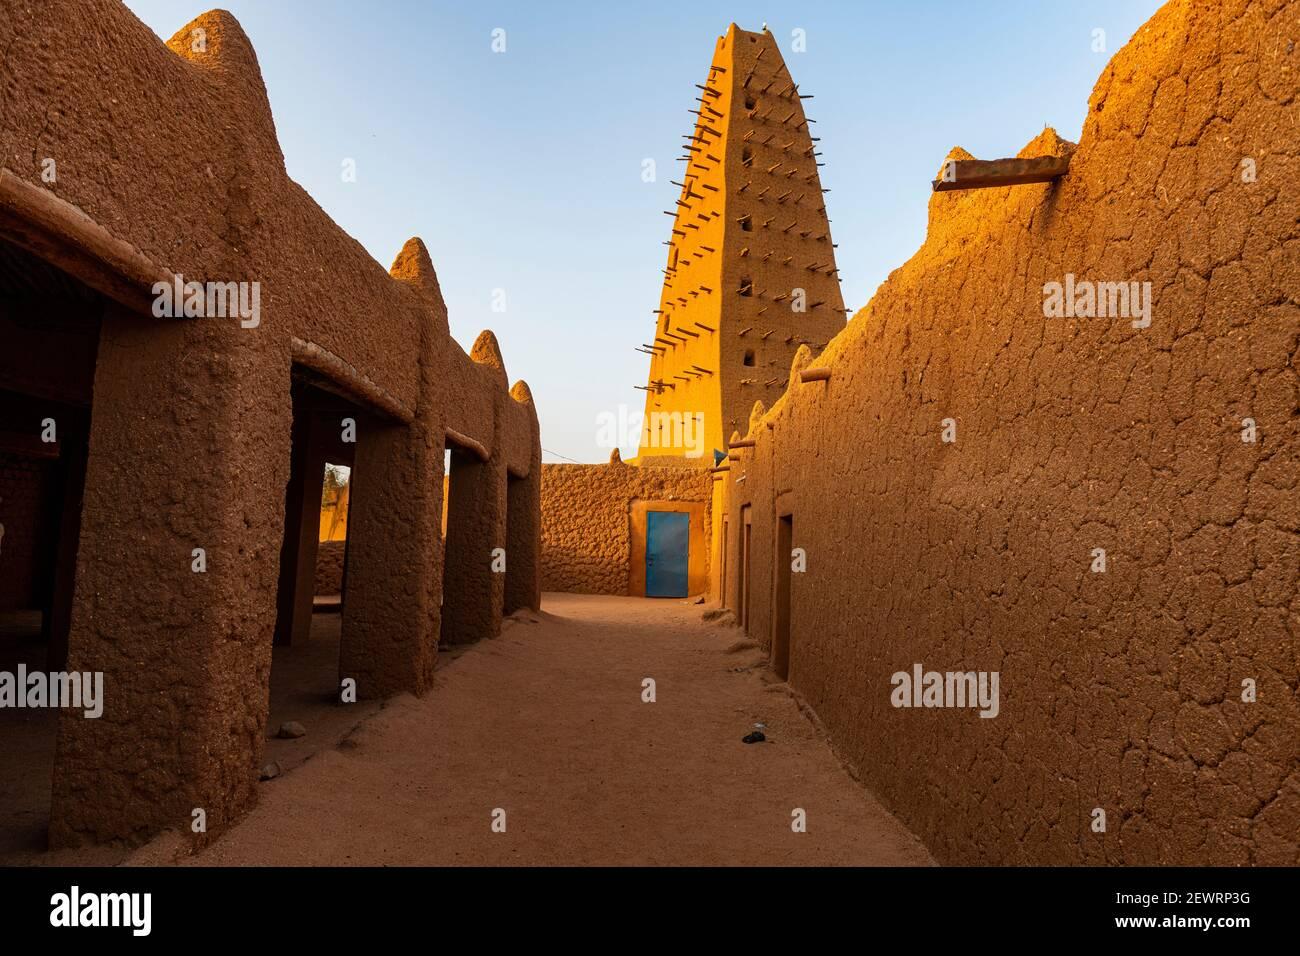 Grand Mosque of Agadez, UNESCO World Heritage Site, Agadez, Niger, Africa Stock Photo